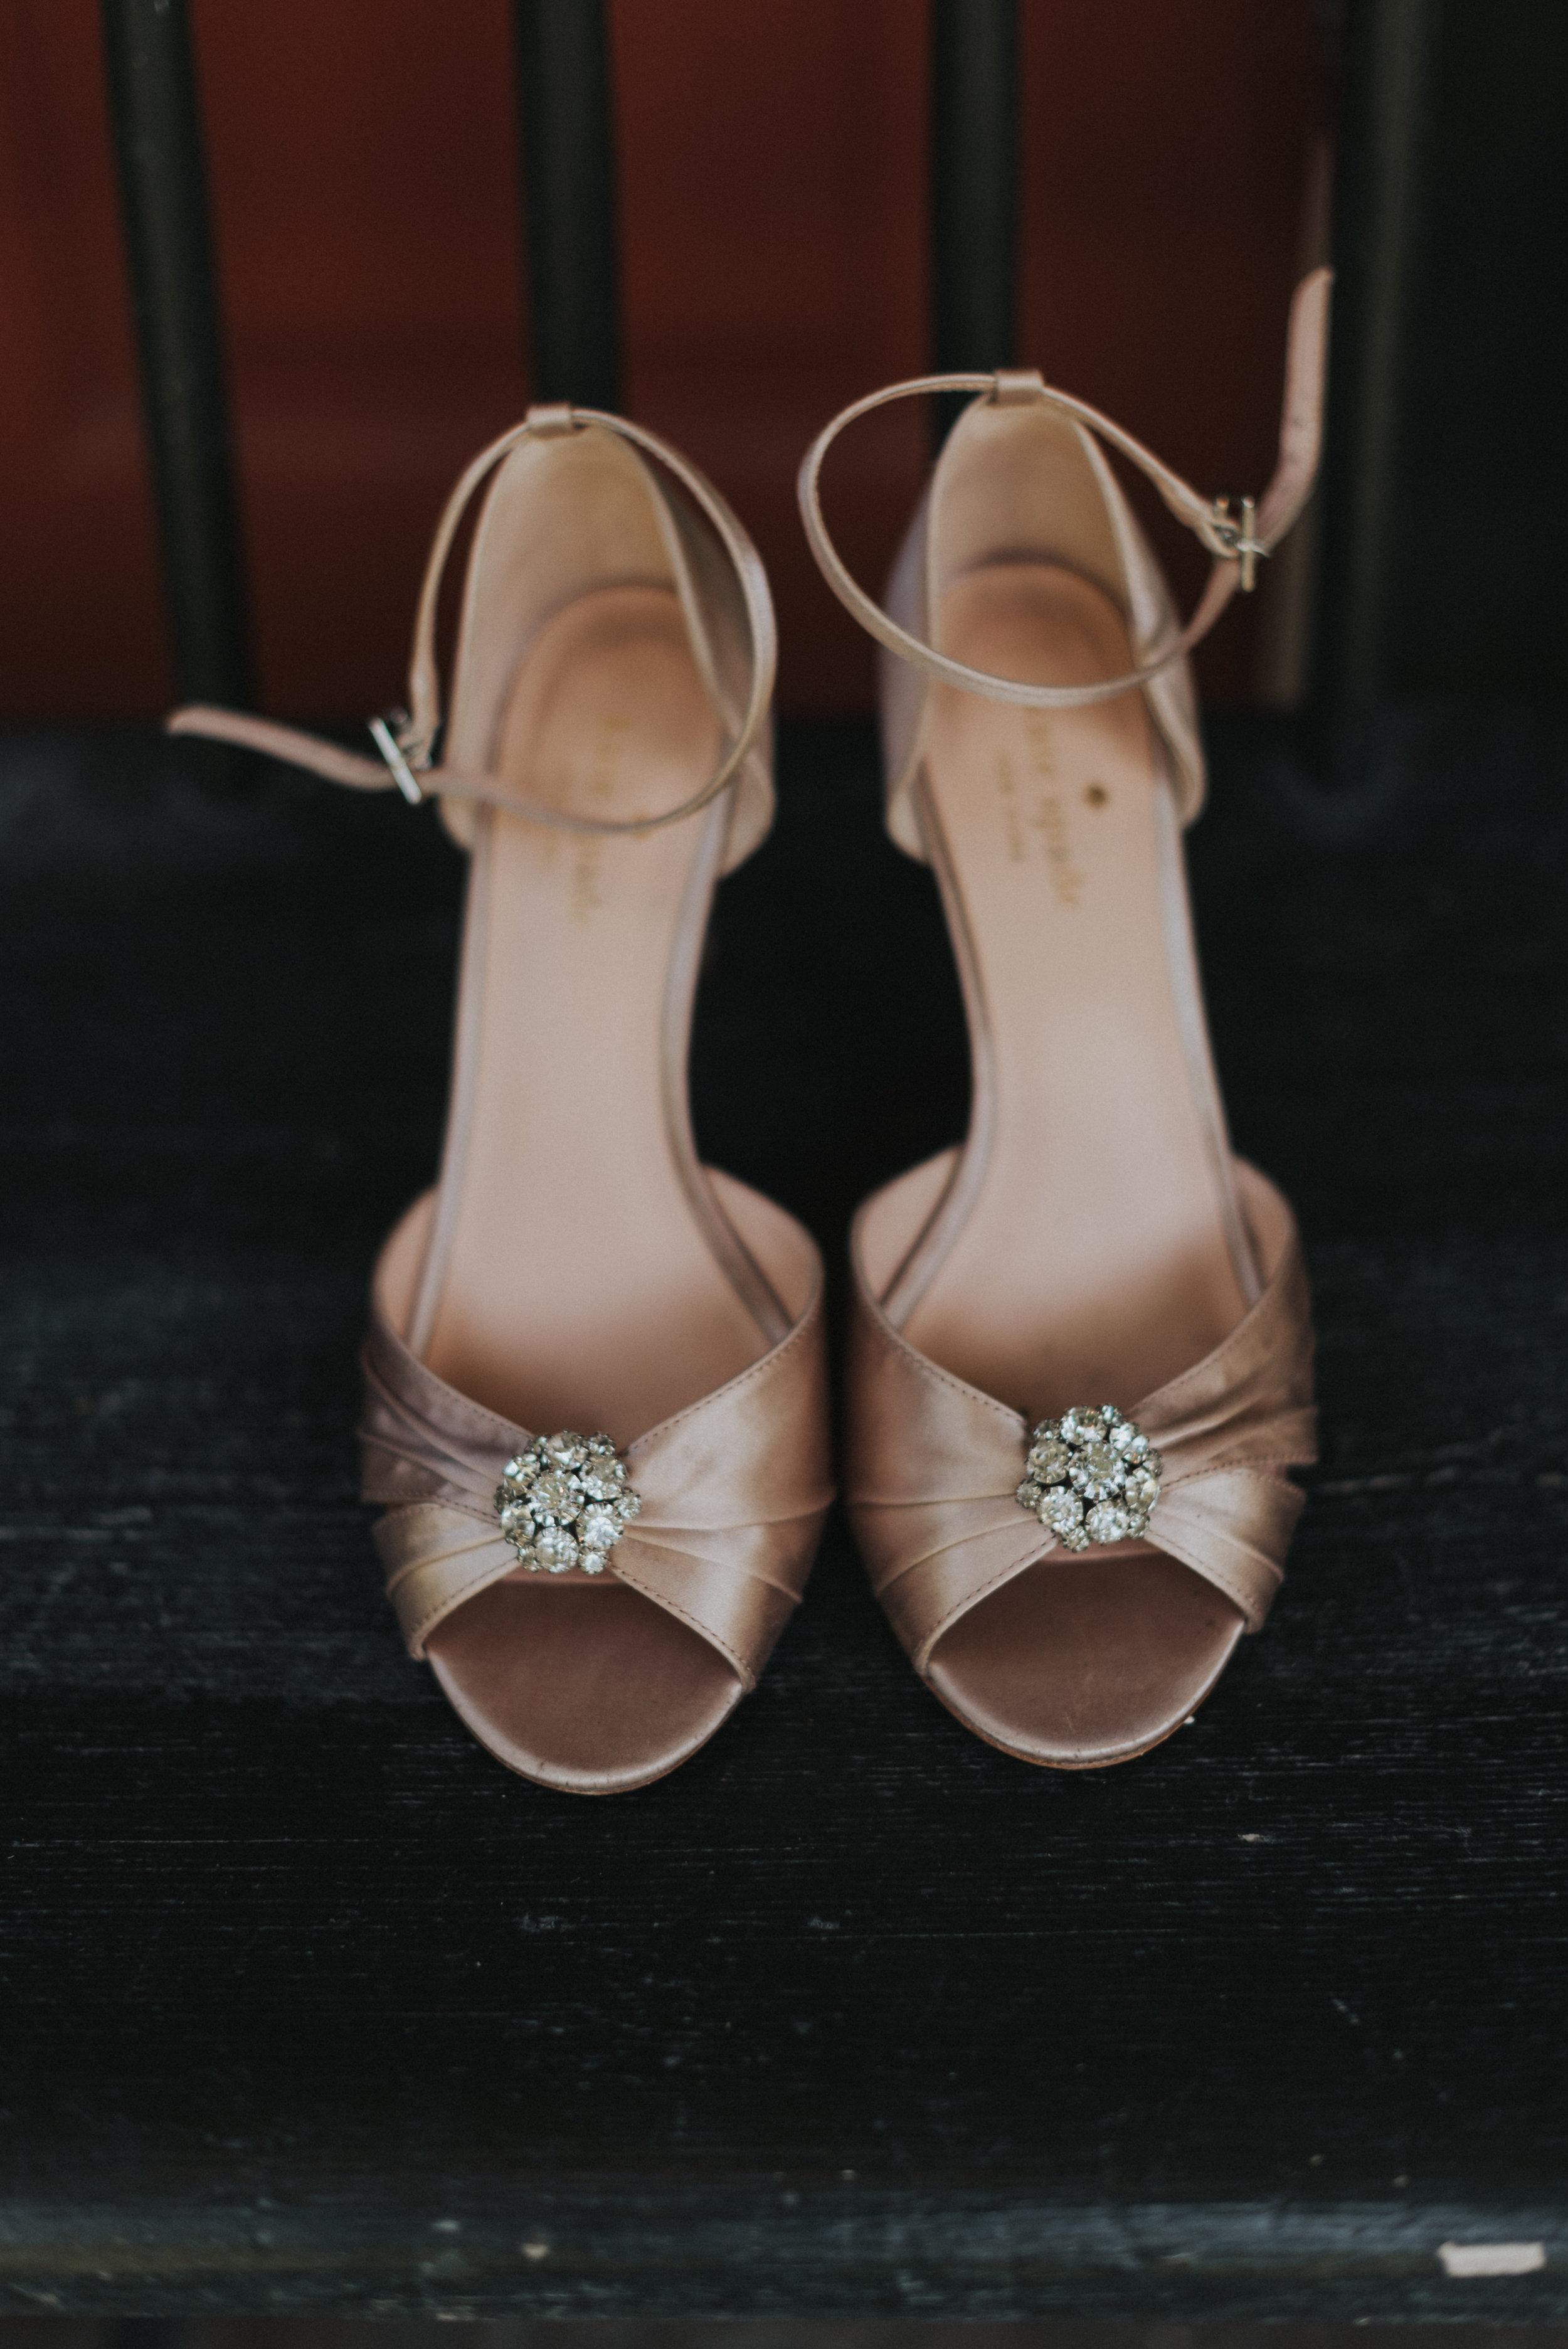 Southern Fete, Southern Wedding, Kate Spade Wedding Shoes